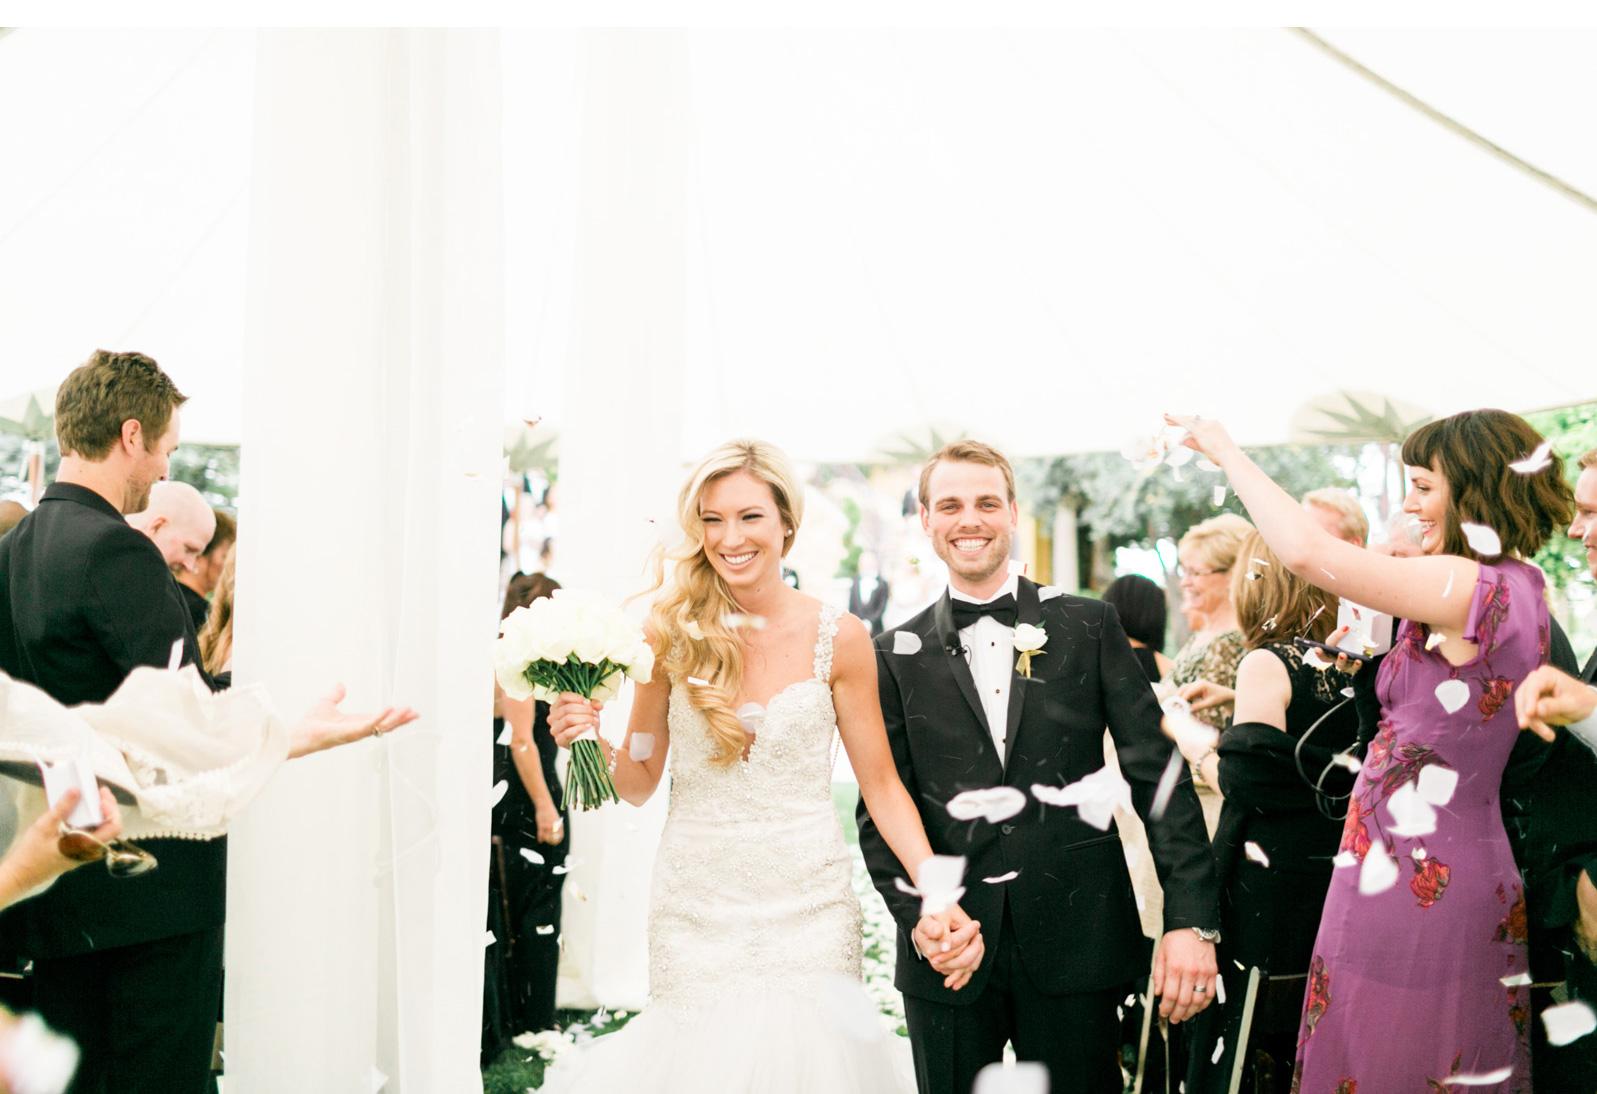 Southern-California-Wedding-Photographer-Natalie-Schutt-Photography_28.jpg